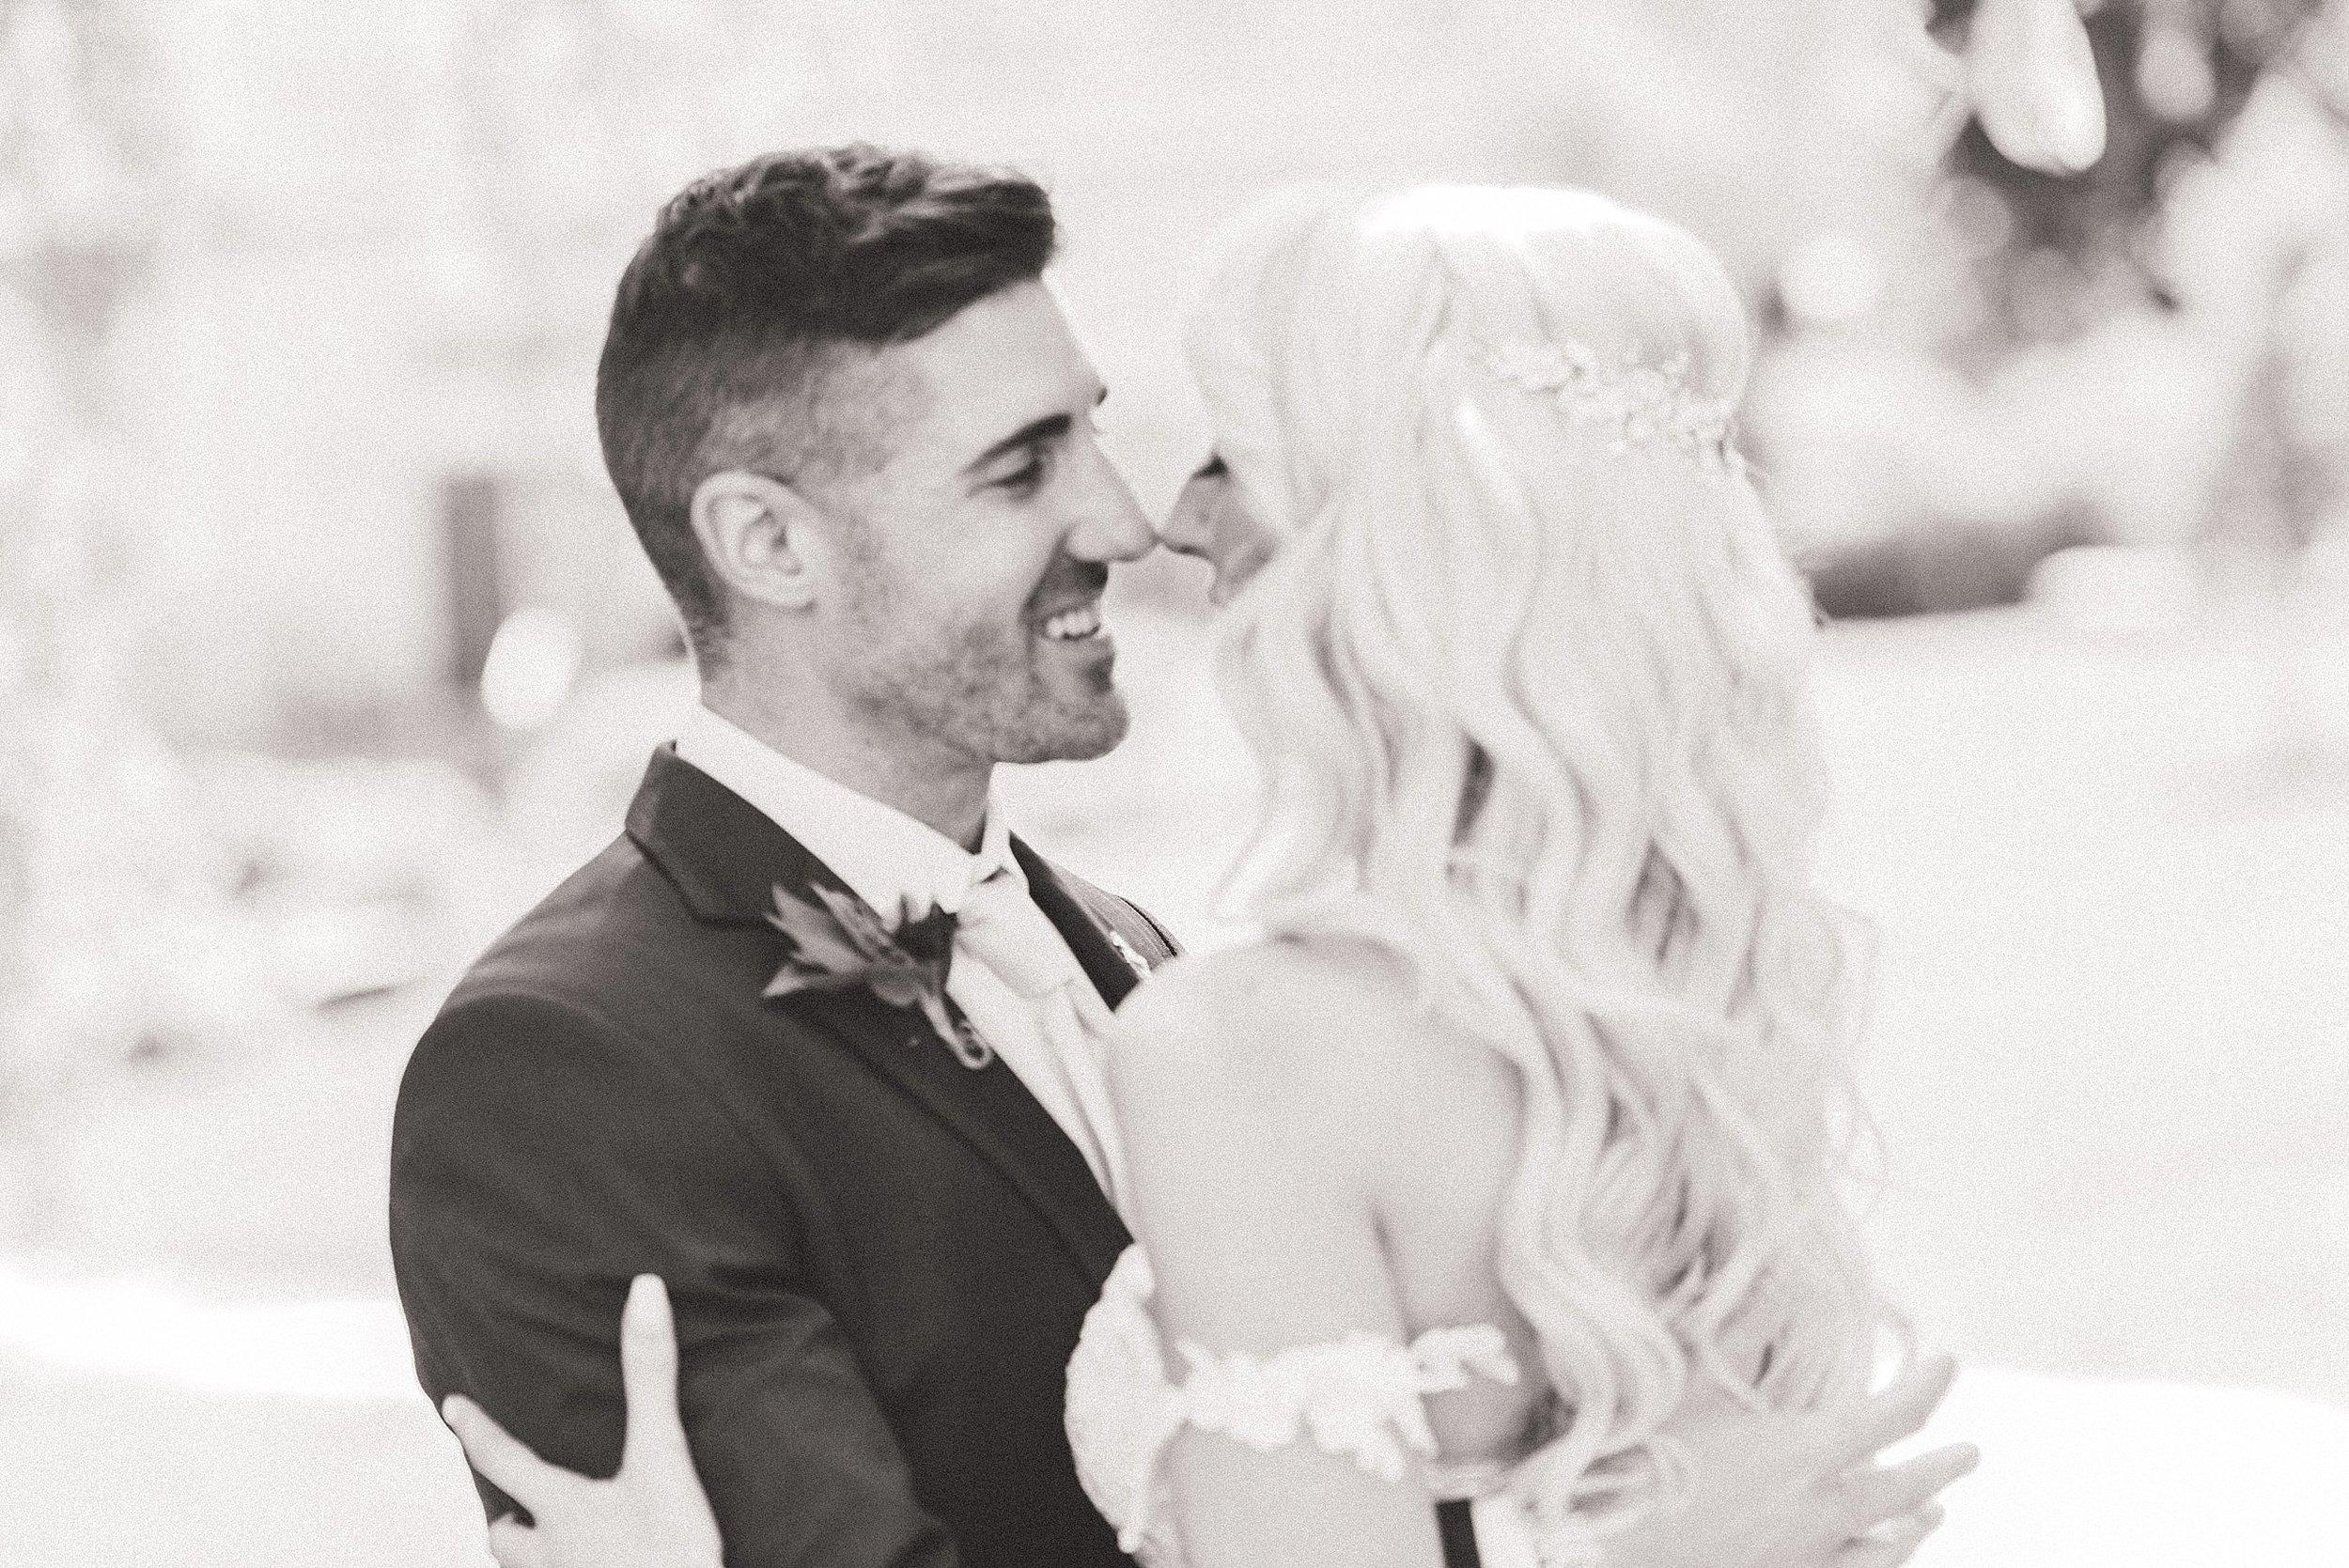 light airy indie fine art ottawa wedding photographer | Ali and Batoul Photography_0032.jpg